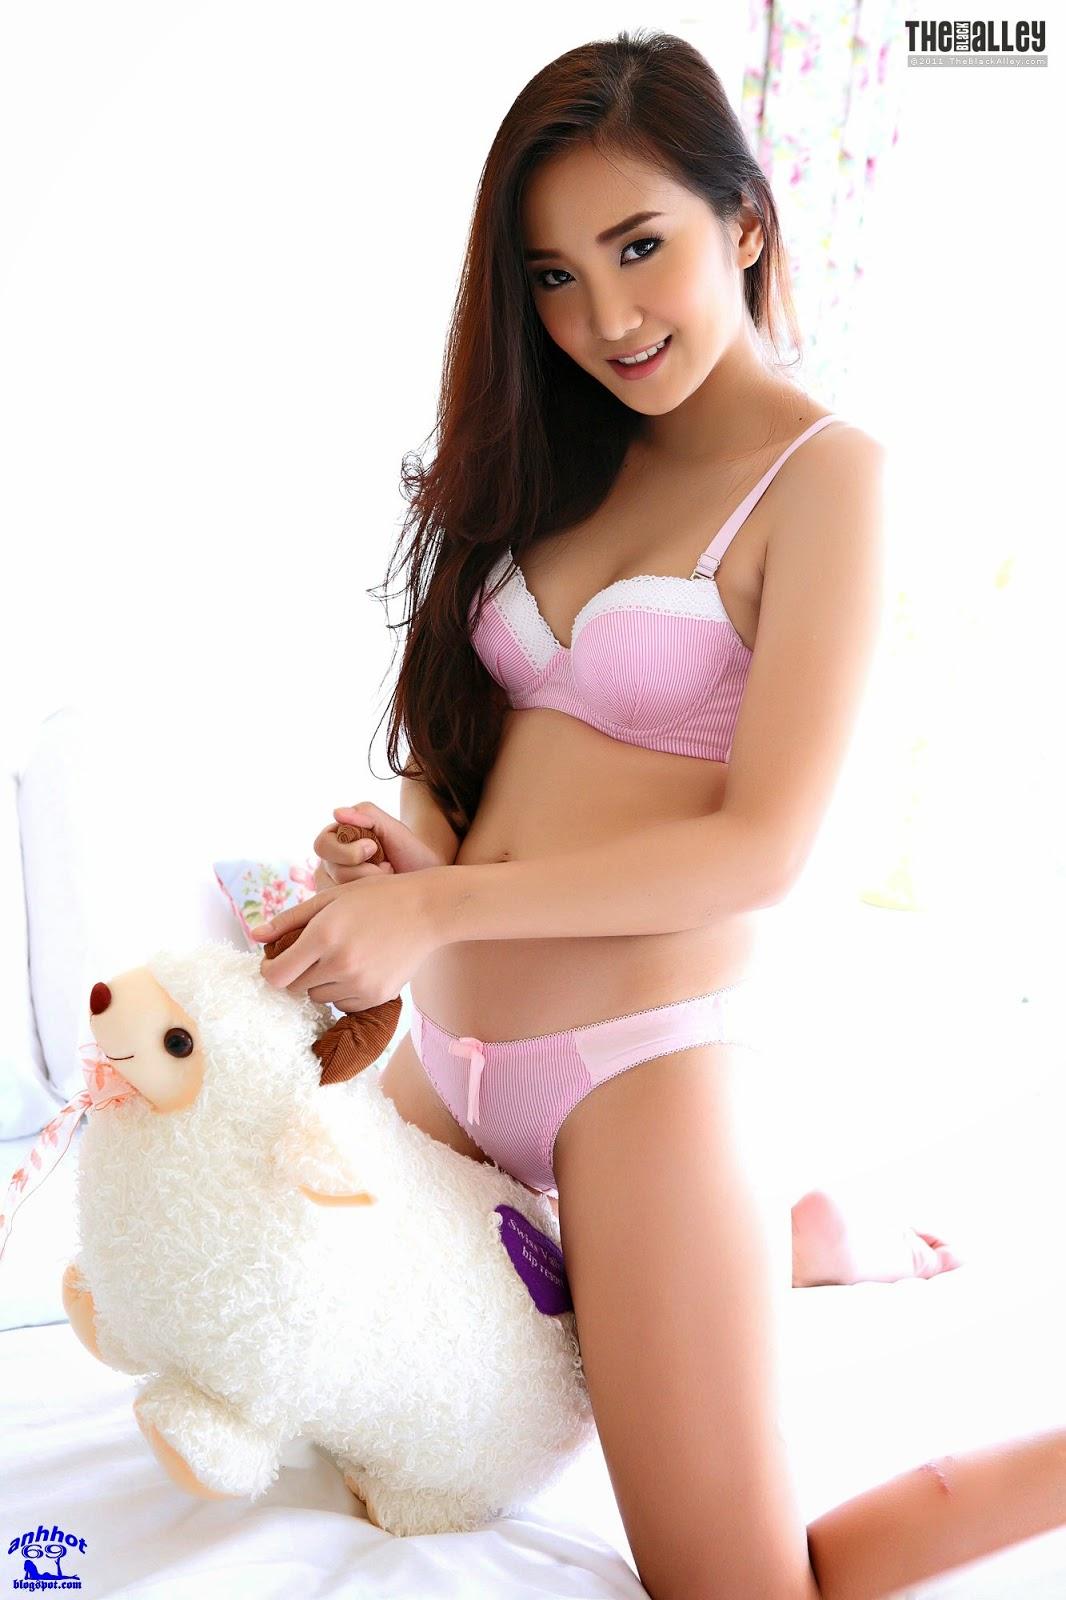 lolita-cheng-64-038